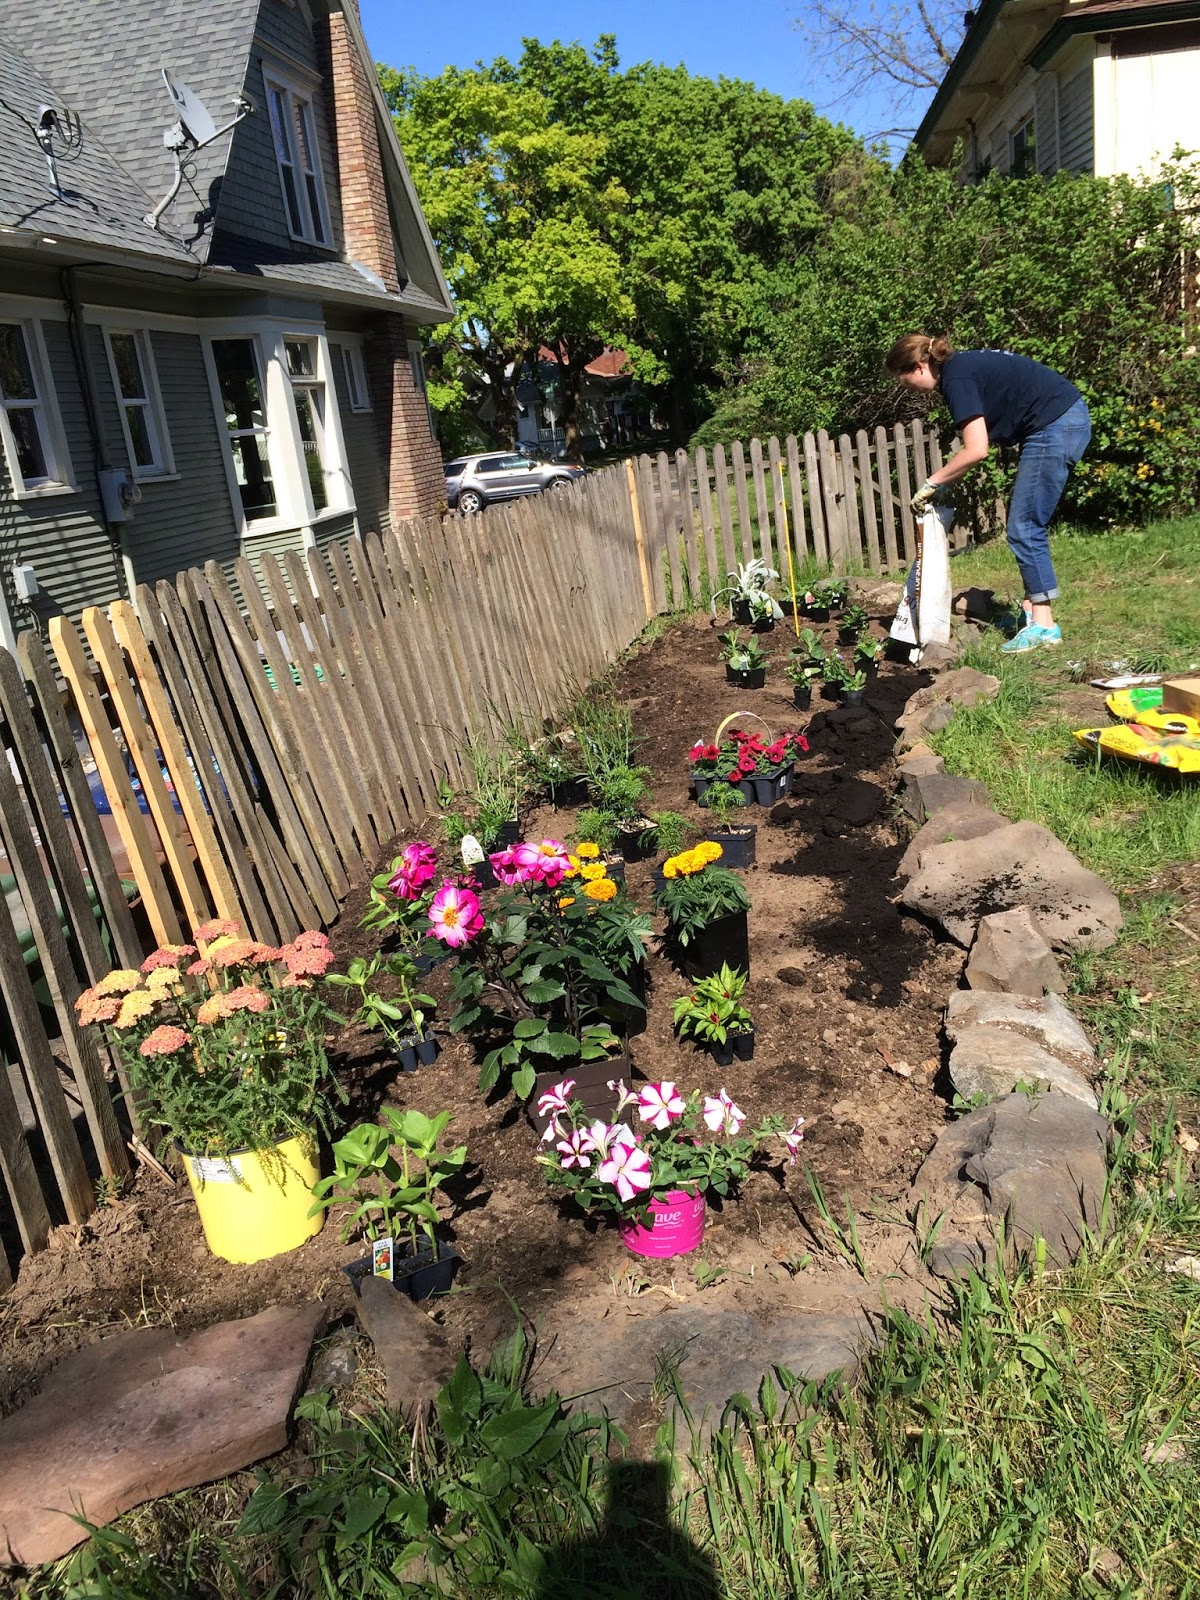 Cheery And Cheer: Mother/Daughter Week in Spokane